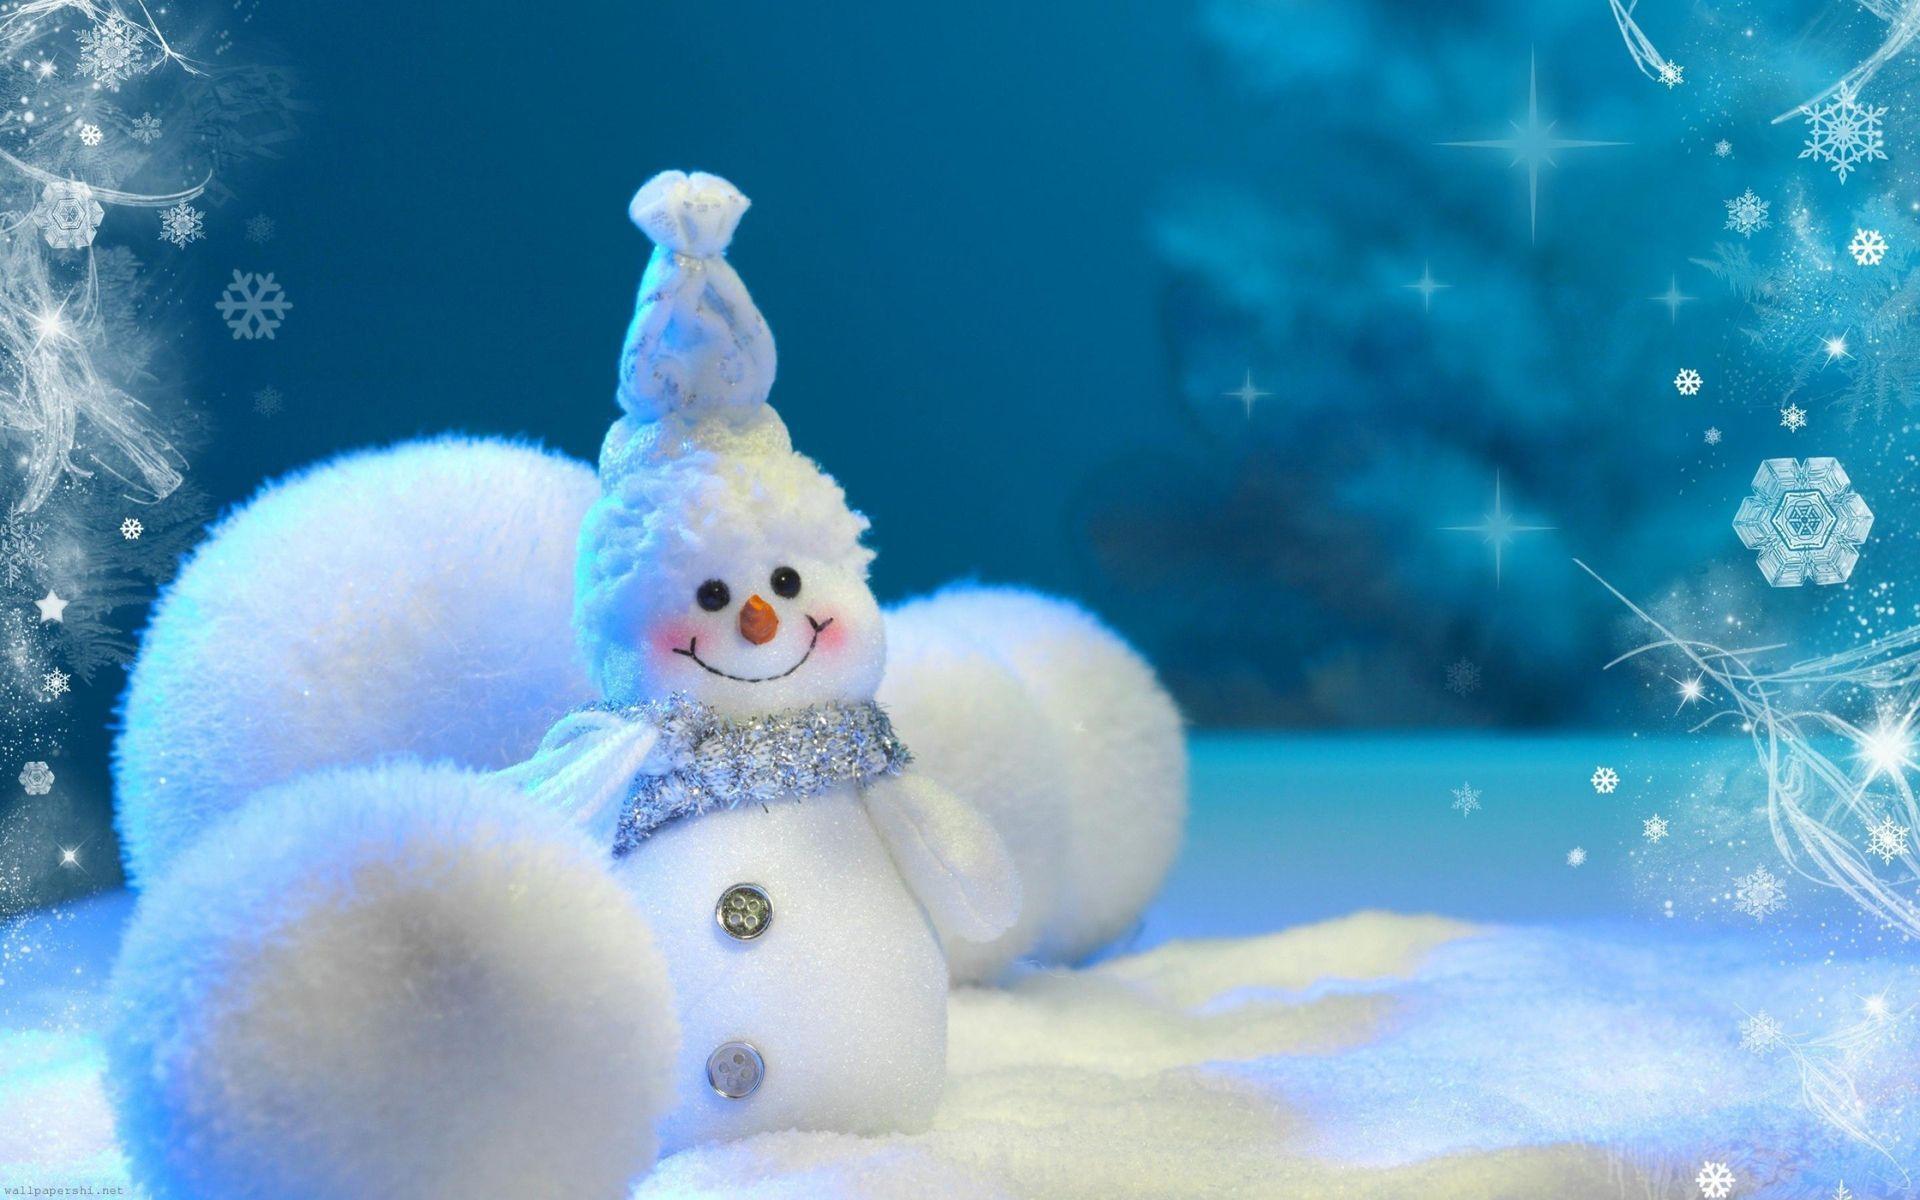 Retro Christmas Desktop Wallpapers Top Free Retro Christmas